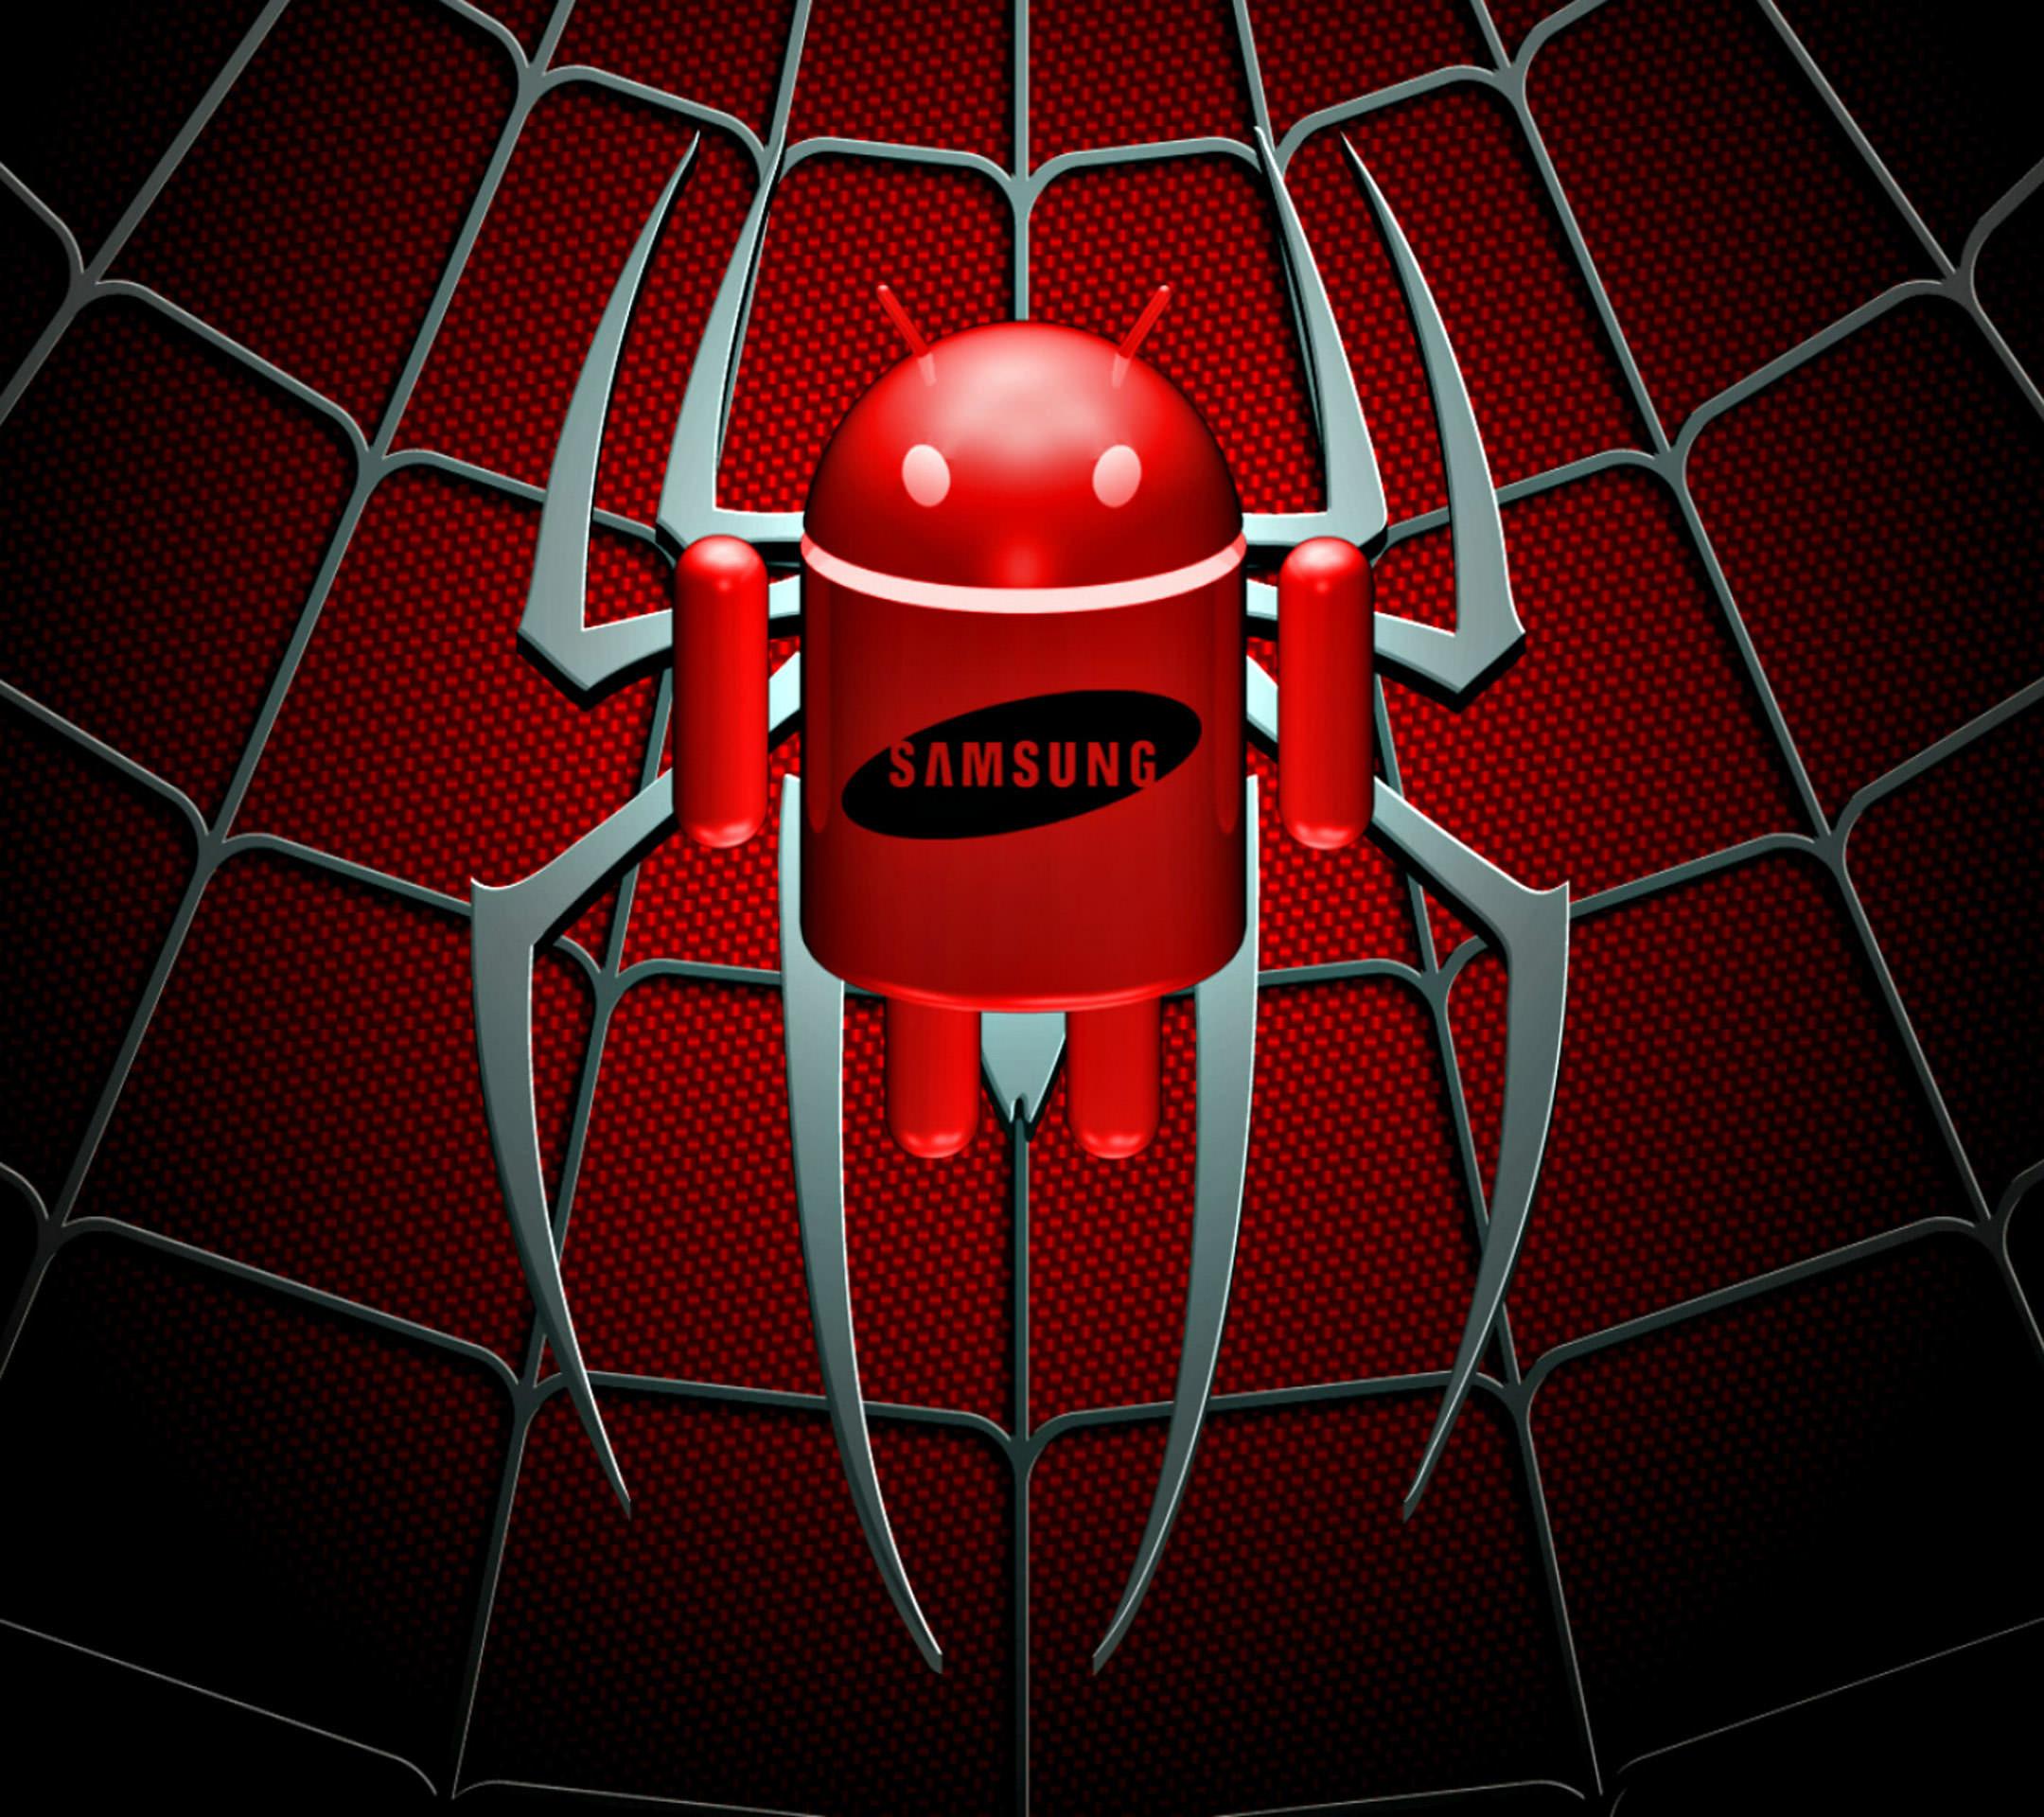 Samsung Logo Wallpaper (80+ Images